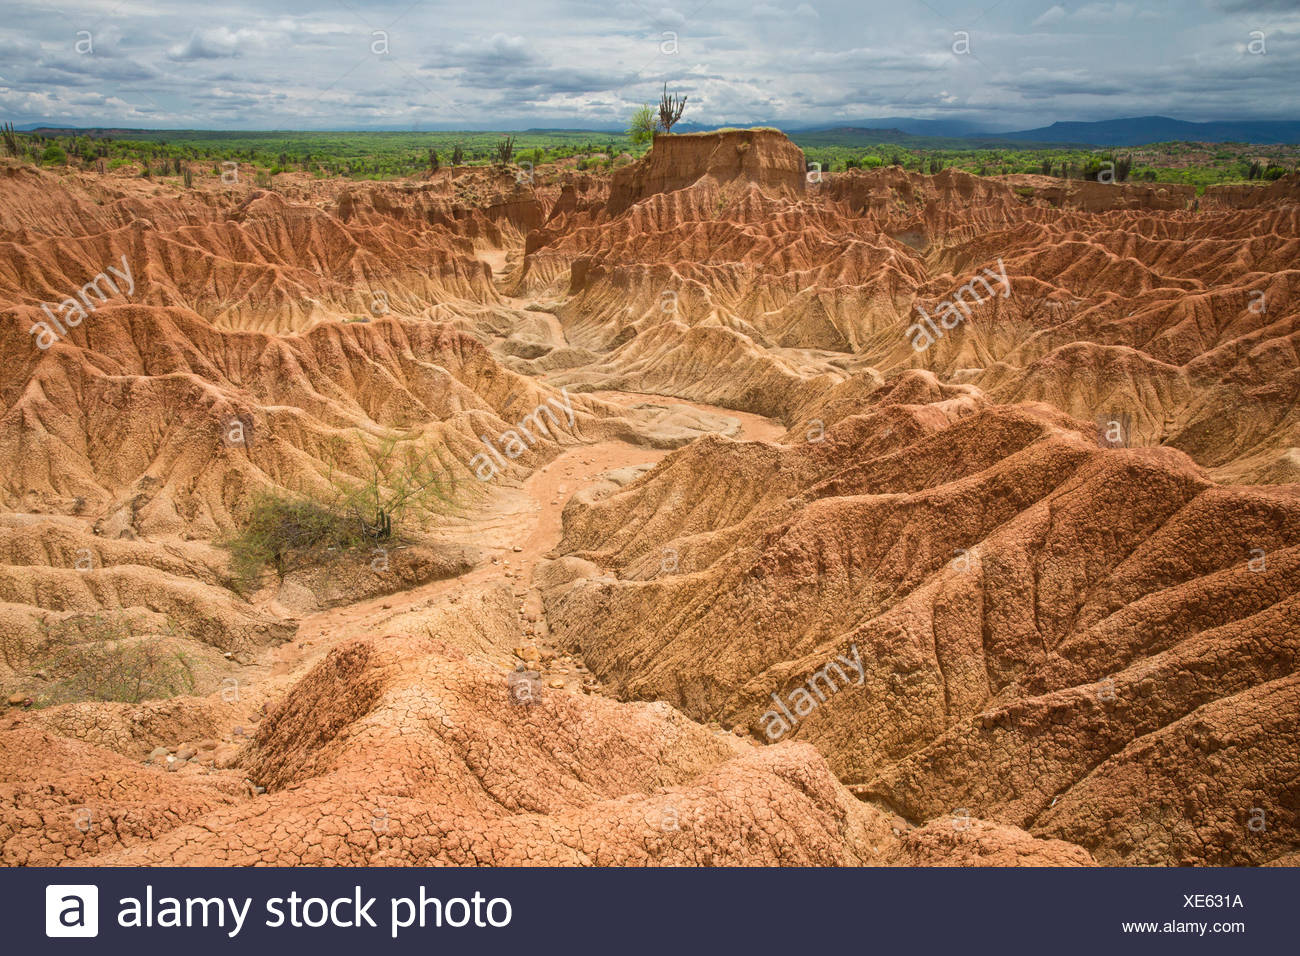 South America, Latin America, Colombia, nature, Tatacao, desert, rock formations, Huila, erosion, national park, - Stock Image